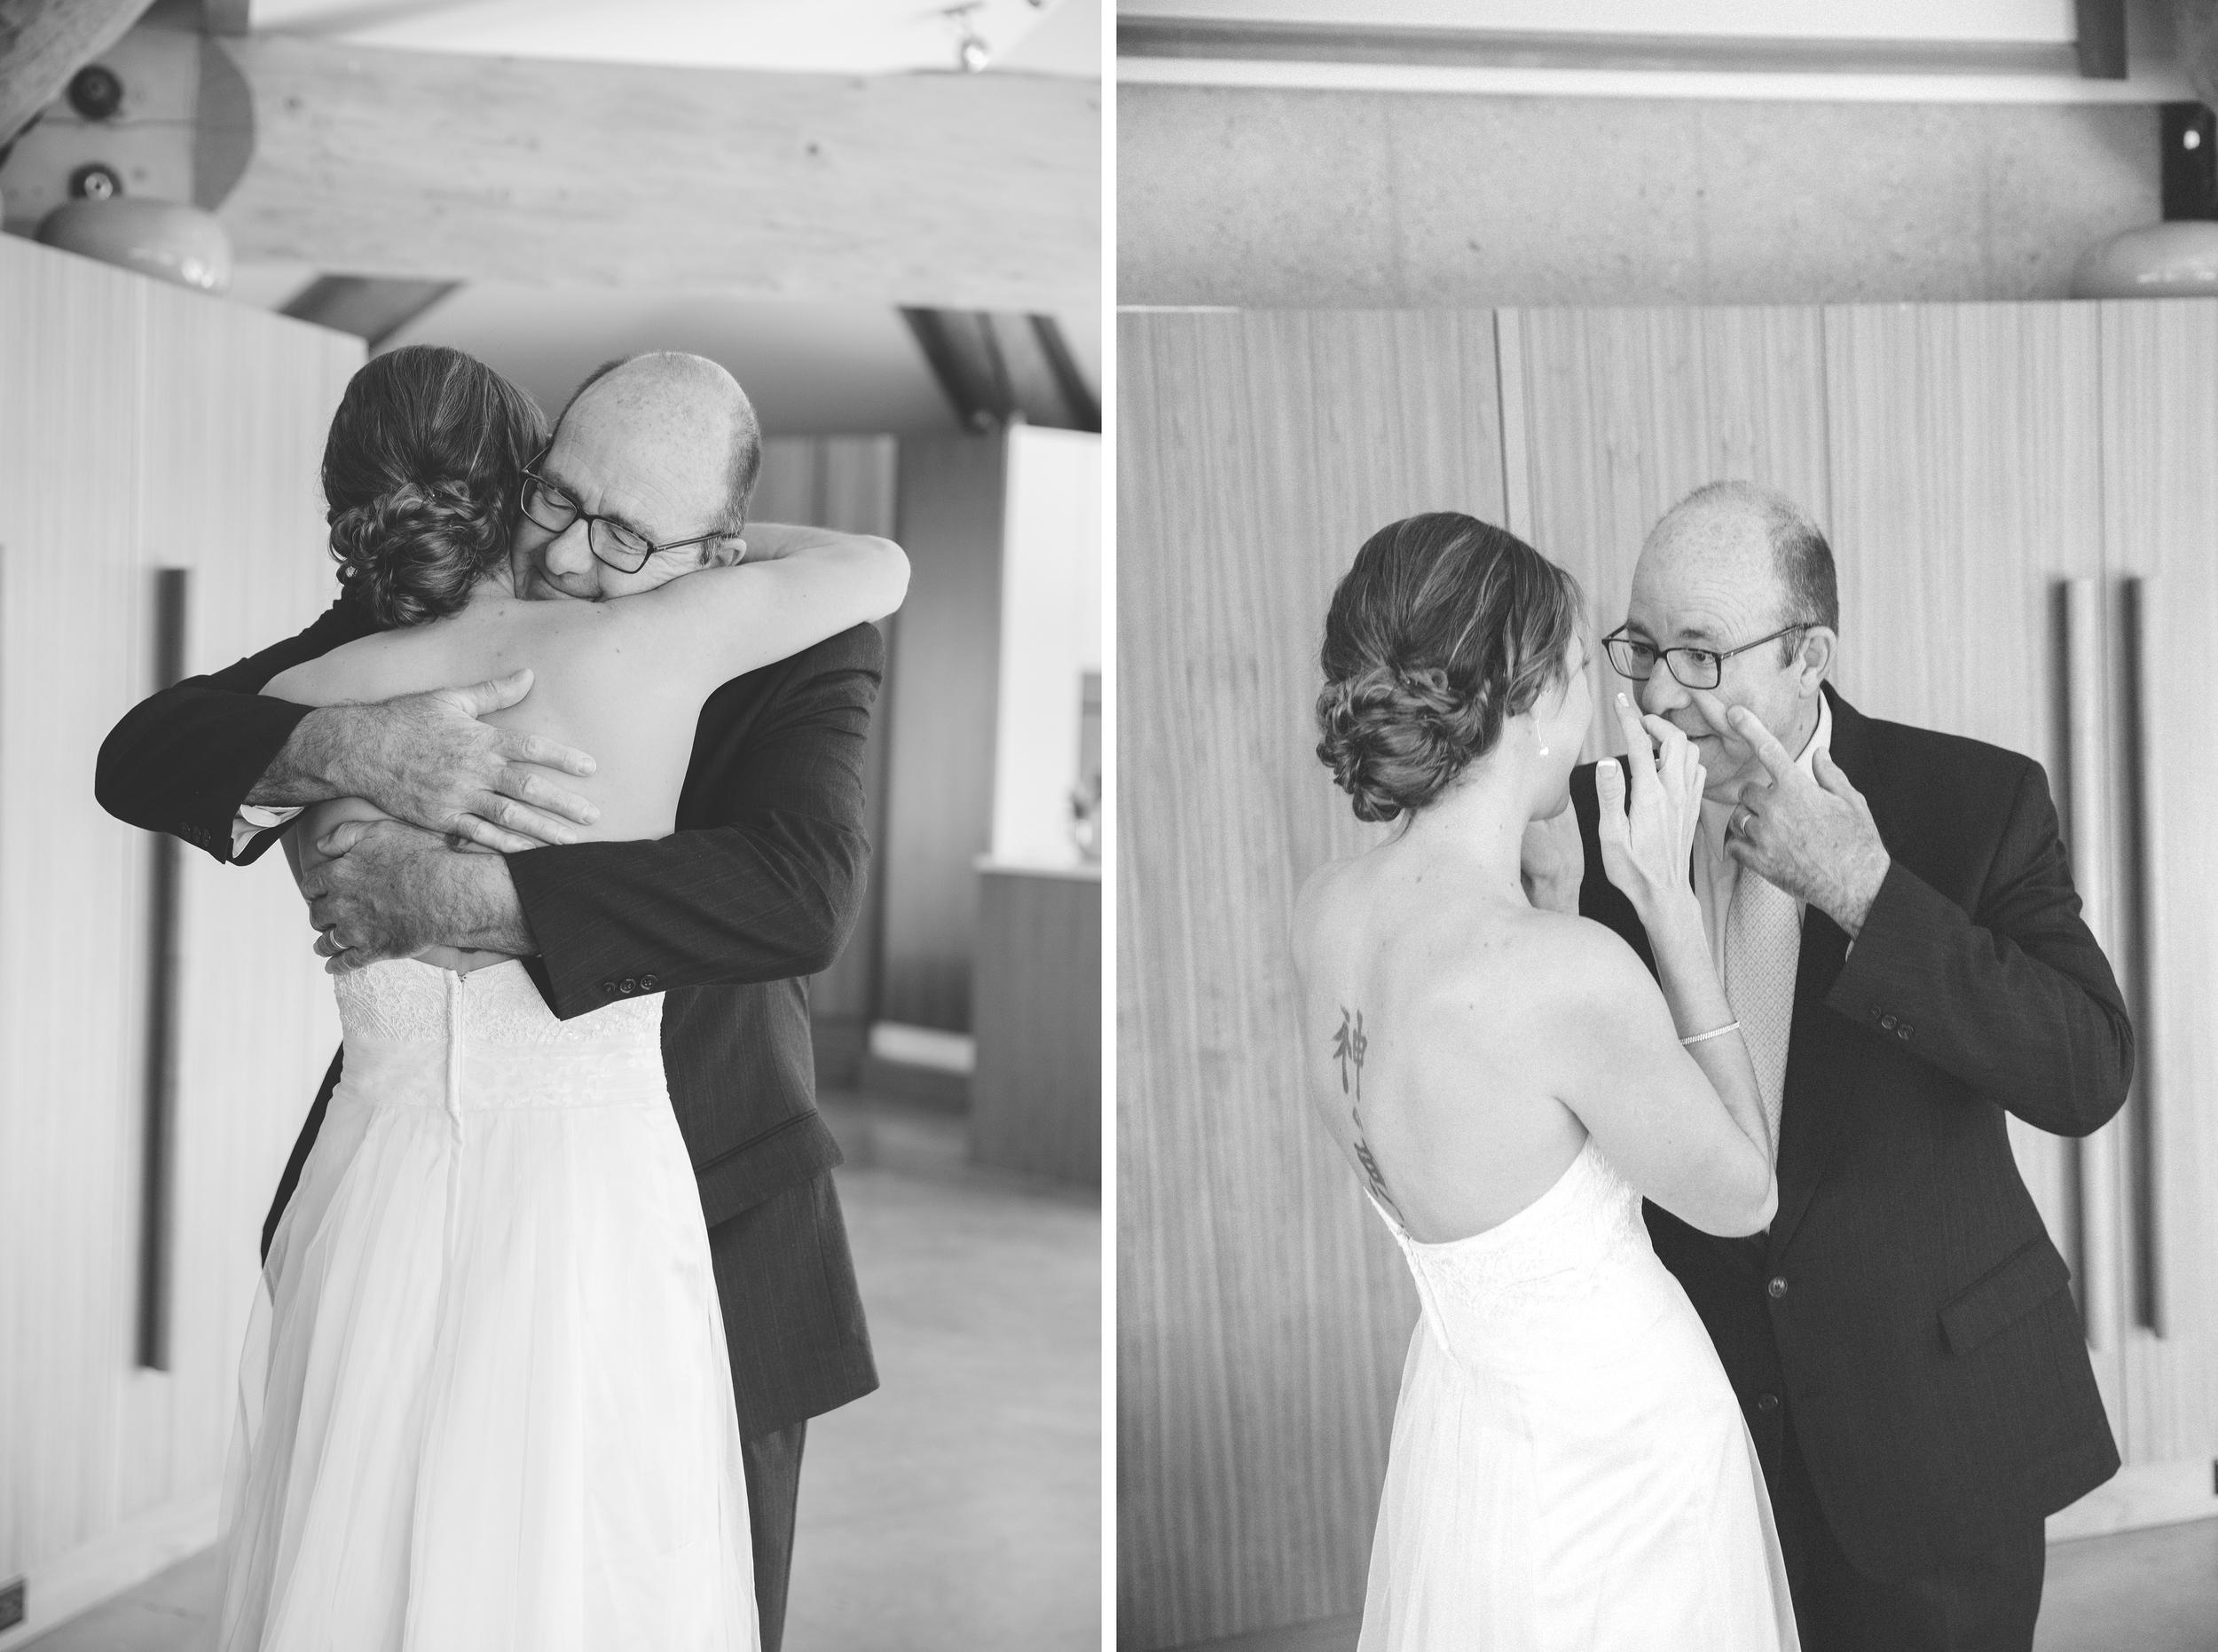 Calgary_Wedding_Photography_Parrish_House_Photos_02.jpg